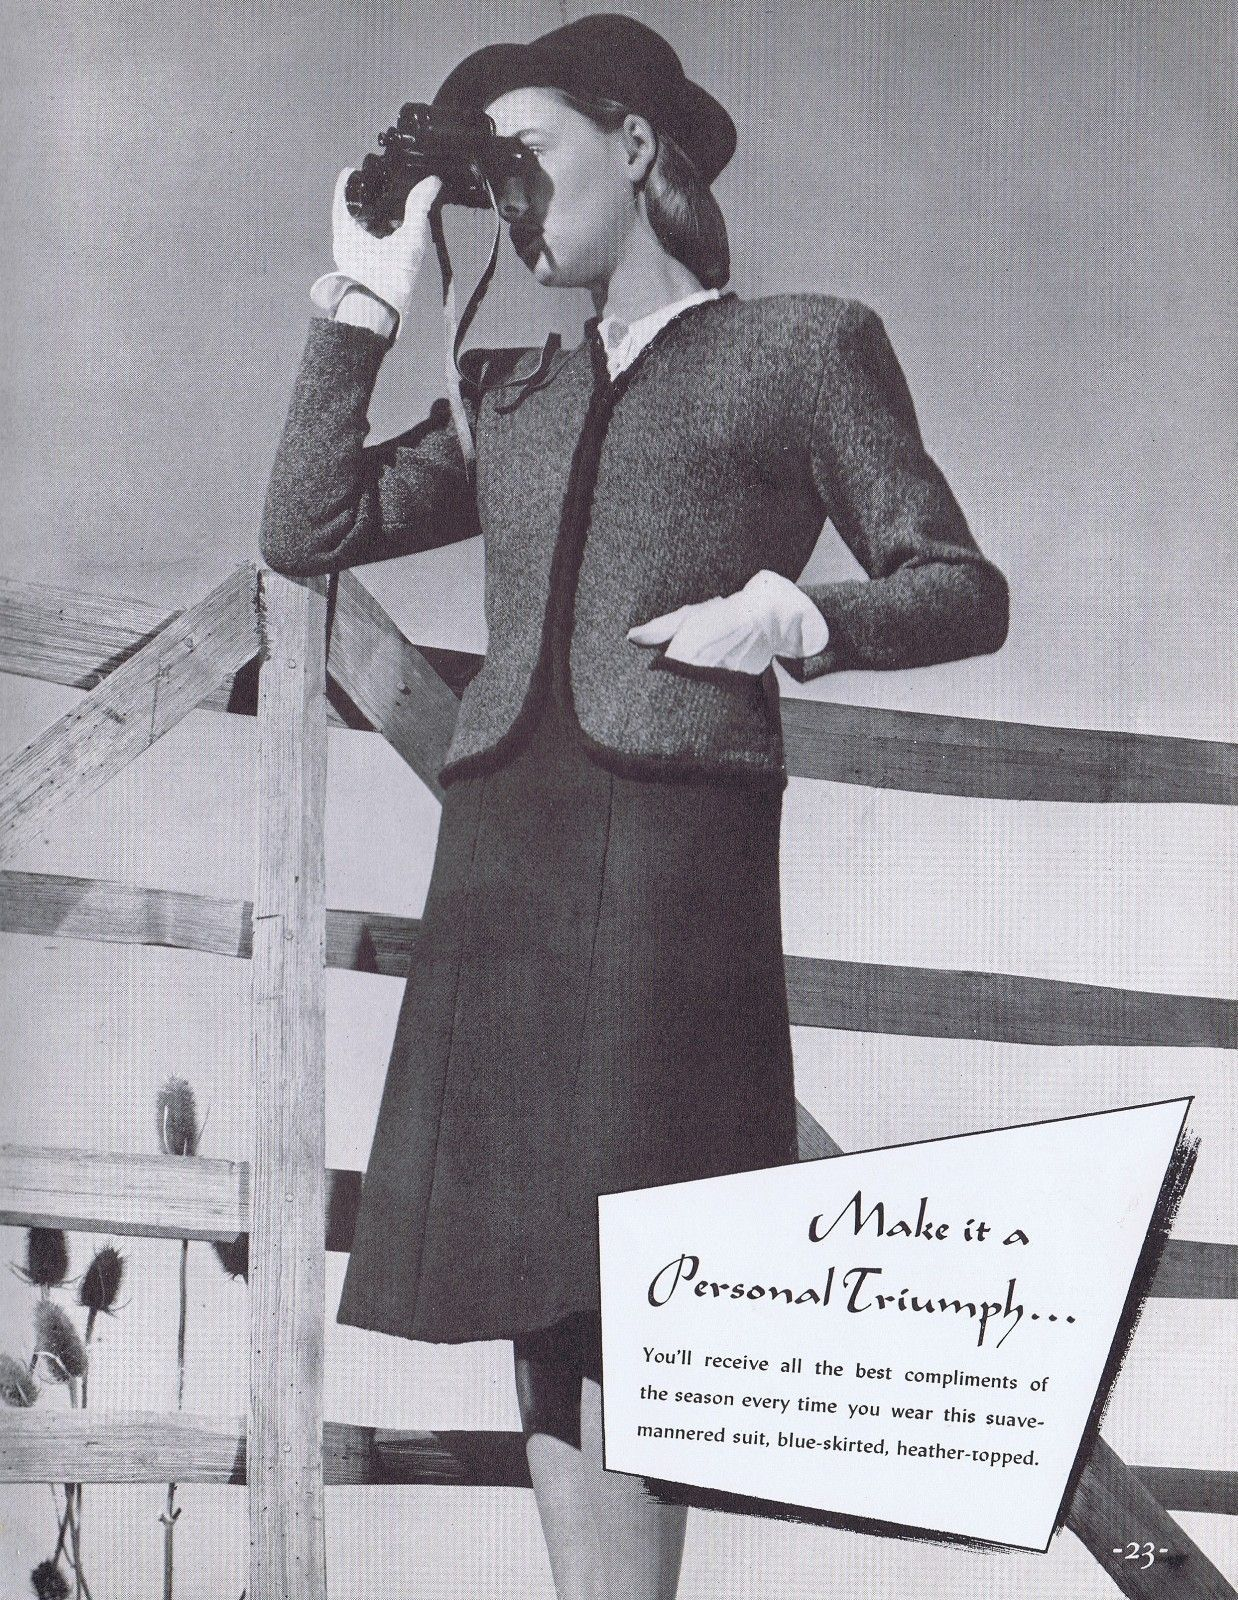 VINTAGE KNITTING PATTERNS 1940s SUIT CARDIGANS DRESSES ...